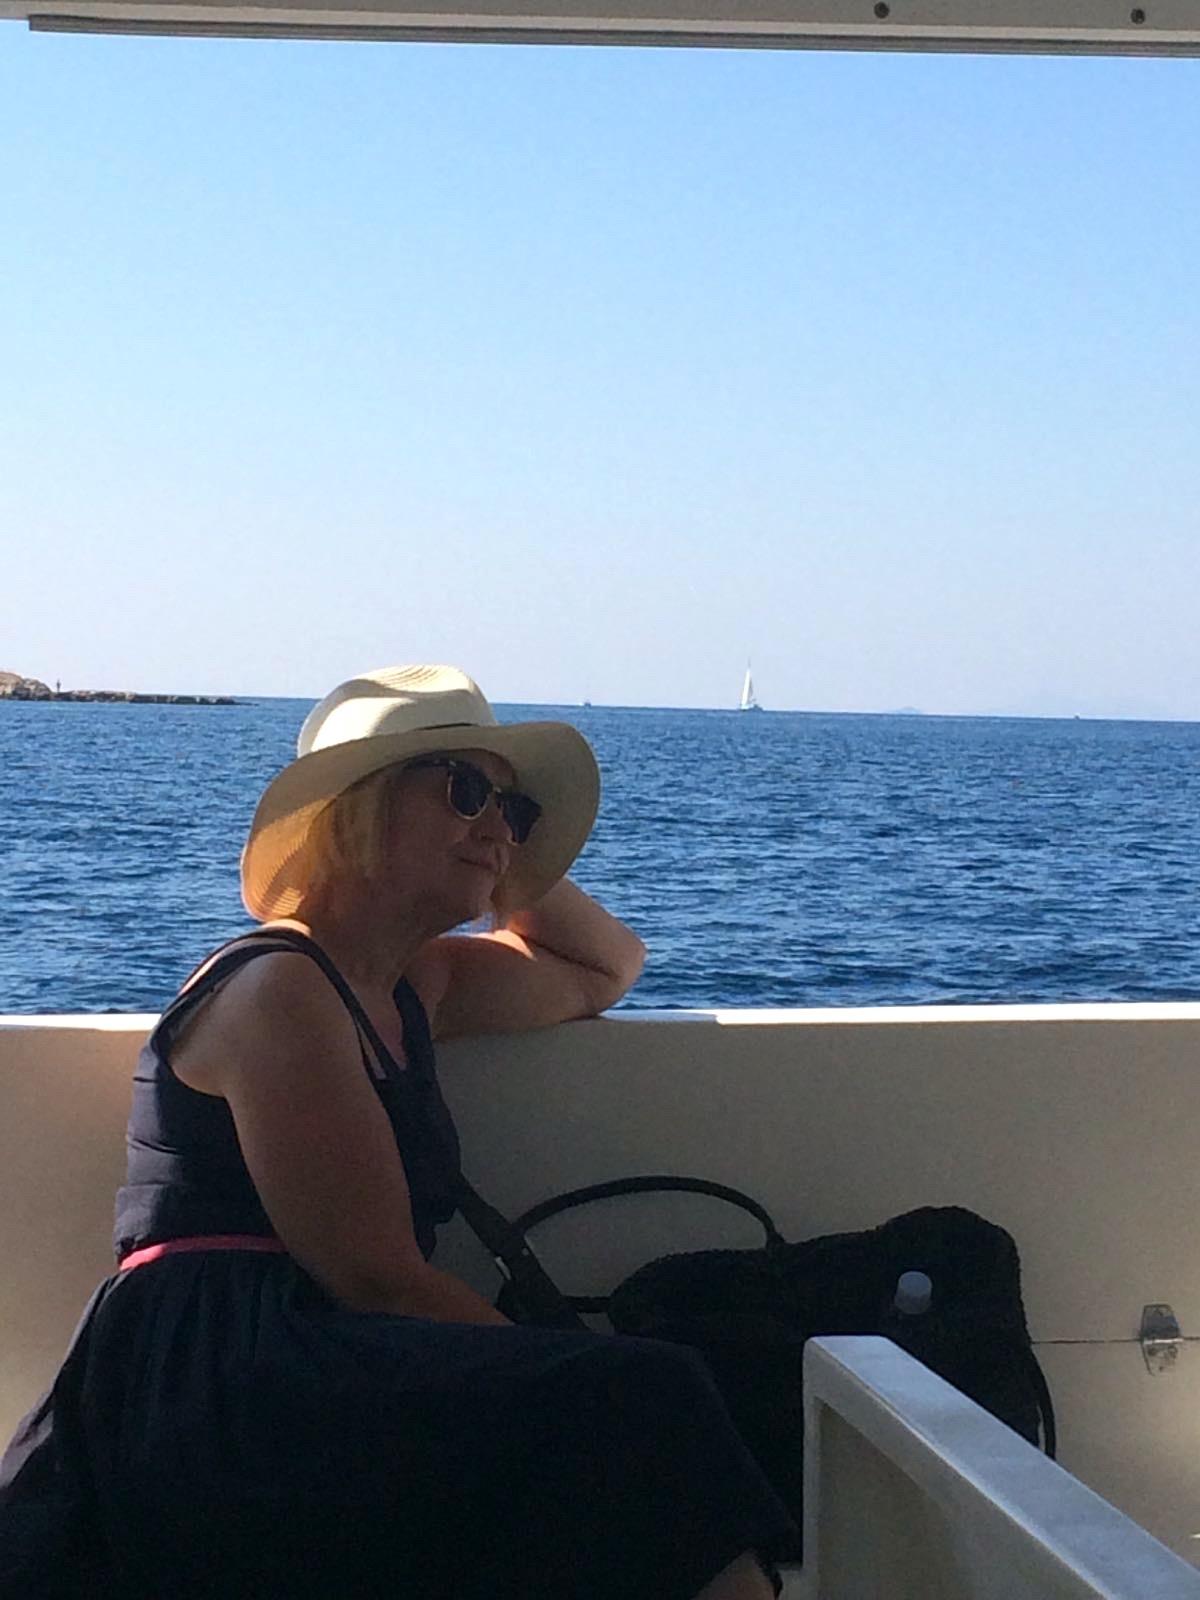 kroatia veneessä